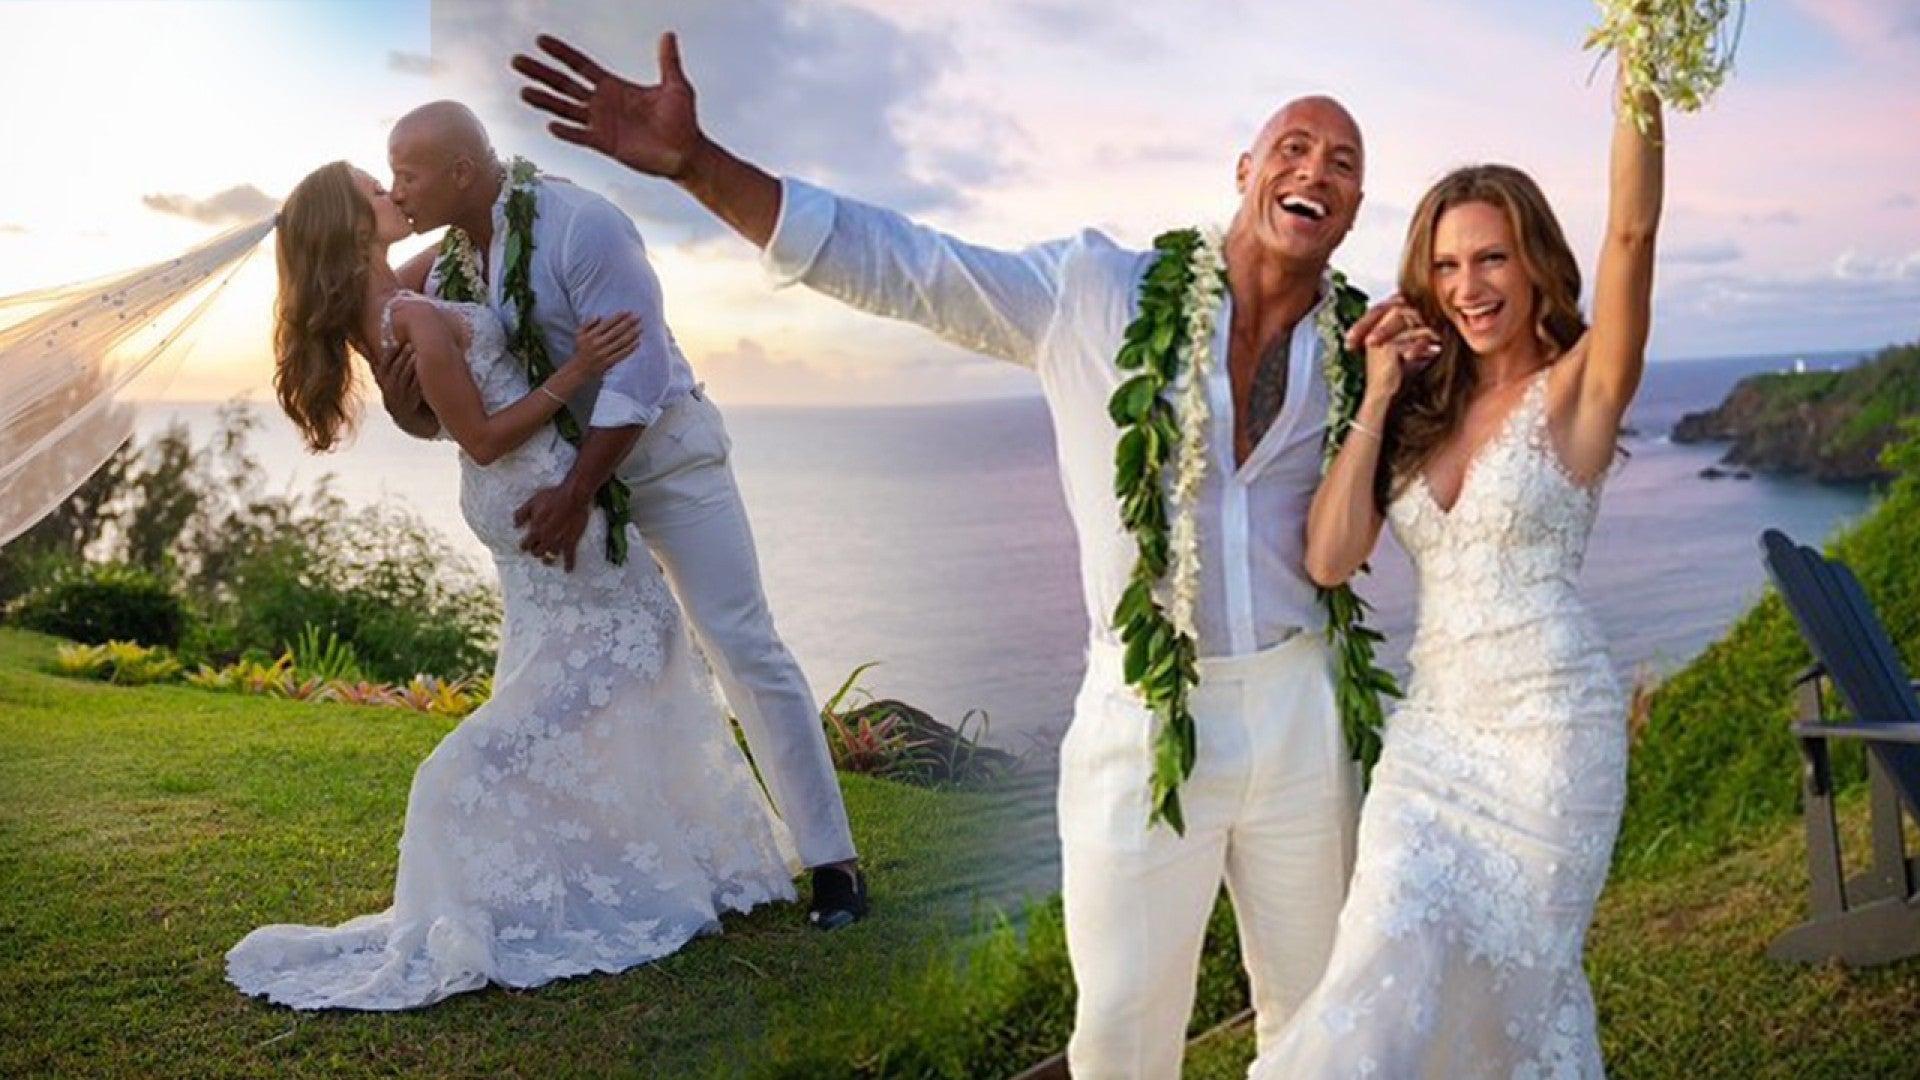 "Resultado de imagen de The Rock was hesitant to remarry: 'My divorce did a number on me'"""